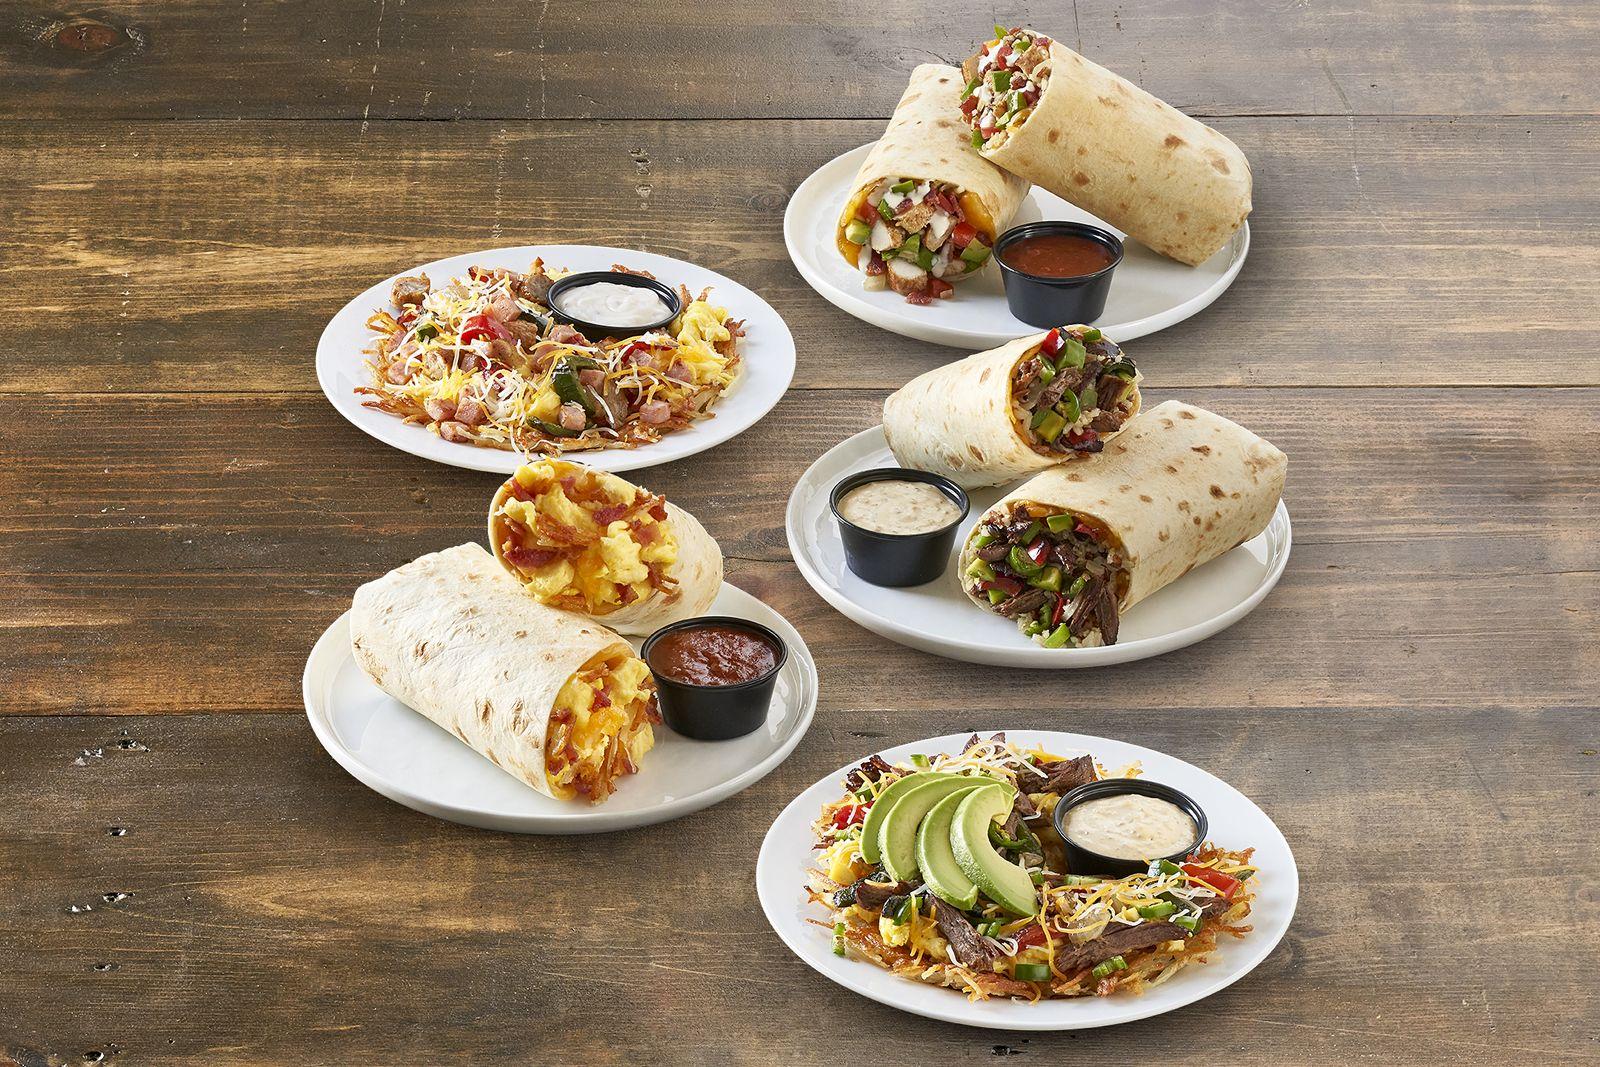 IHOP Introduces New Signature Burritos & Bowls